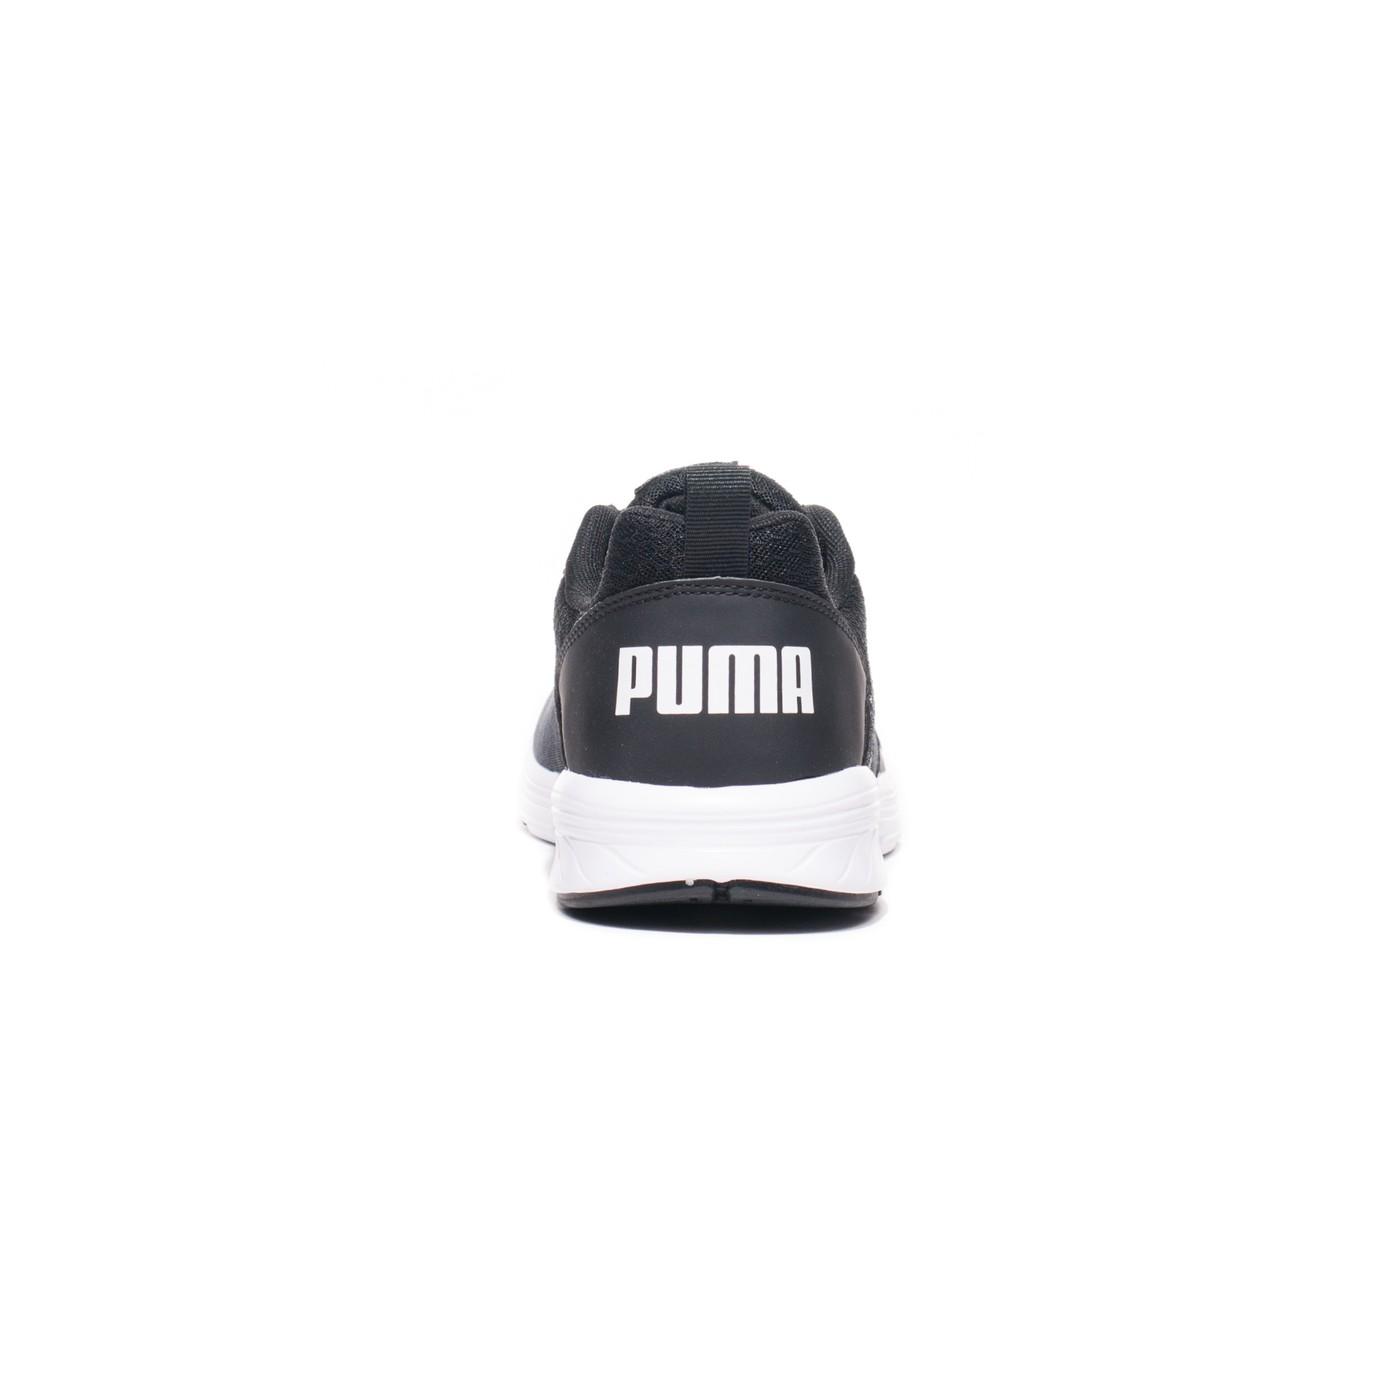 Чоловічі кросівки Puma NRGY COMET